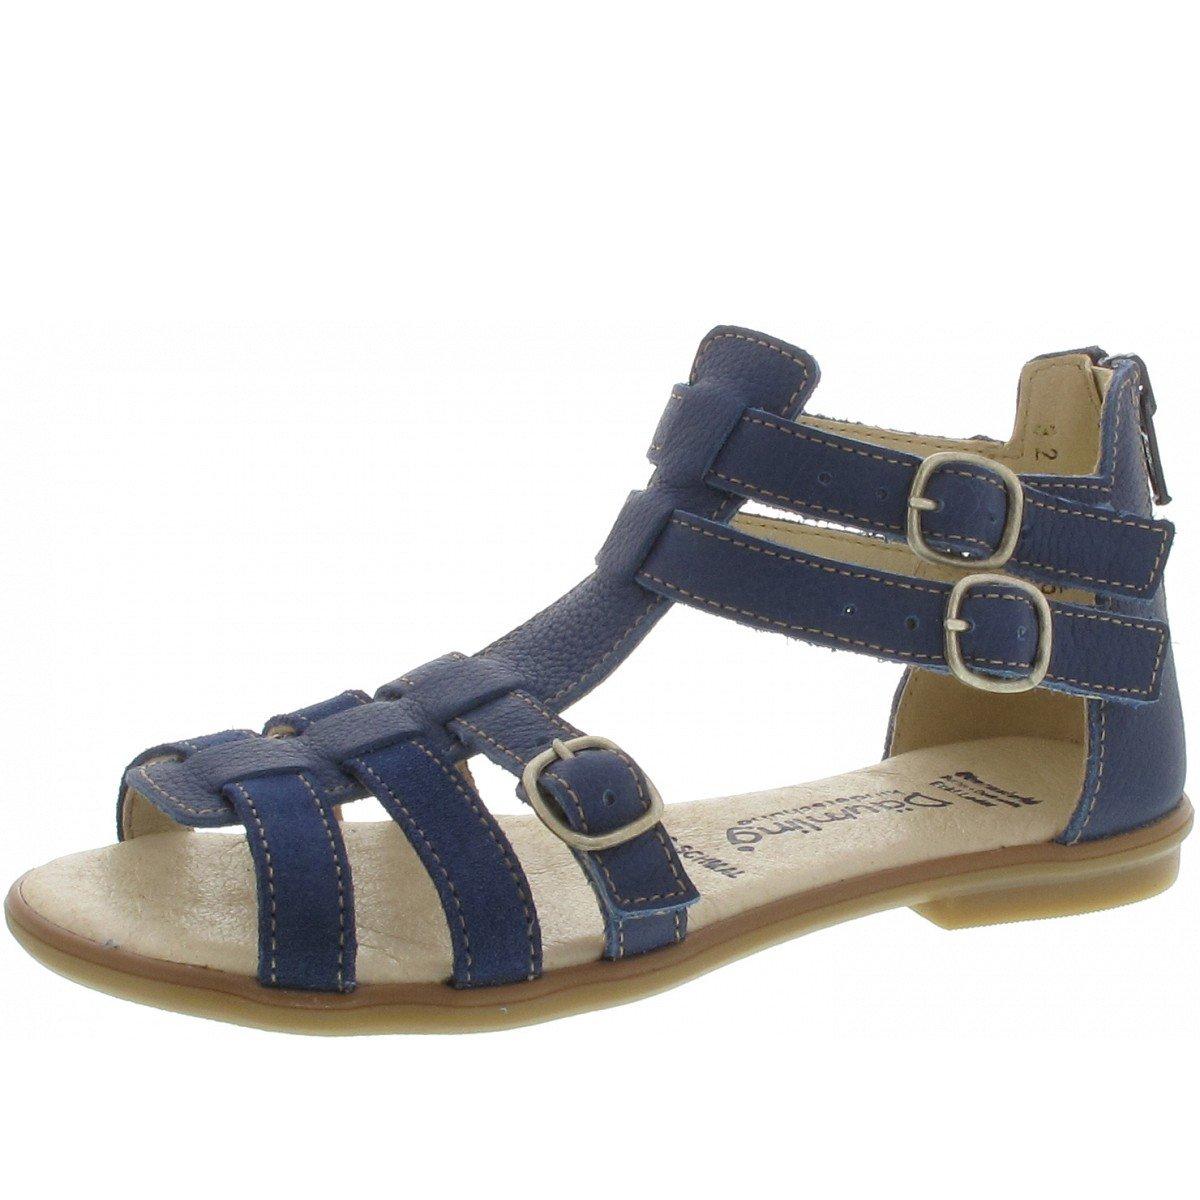 Däumling Regula Sandalette blau: : Schuhe & Handtaschen